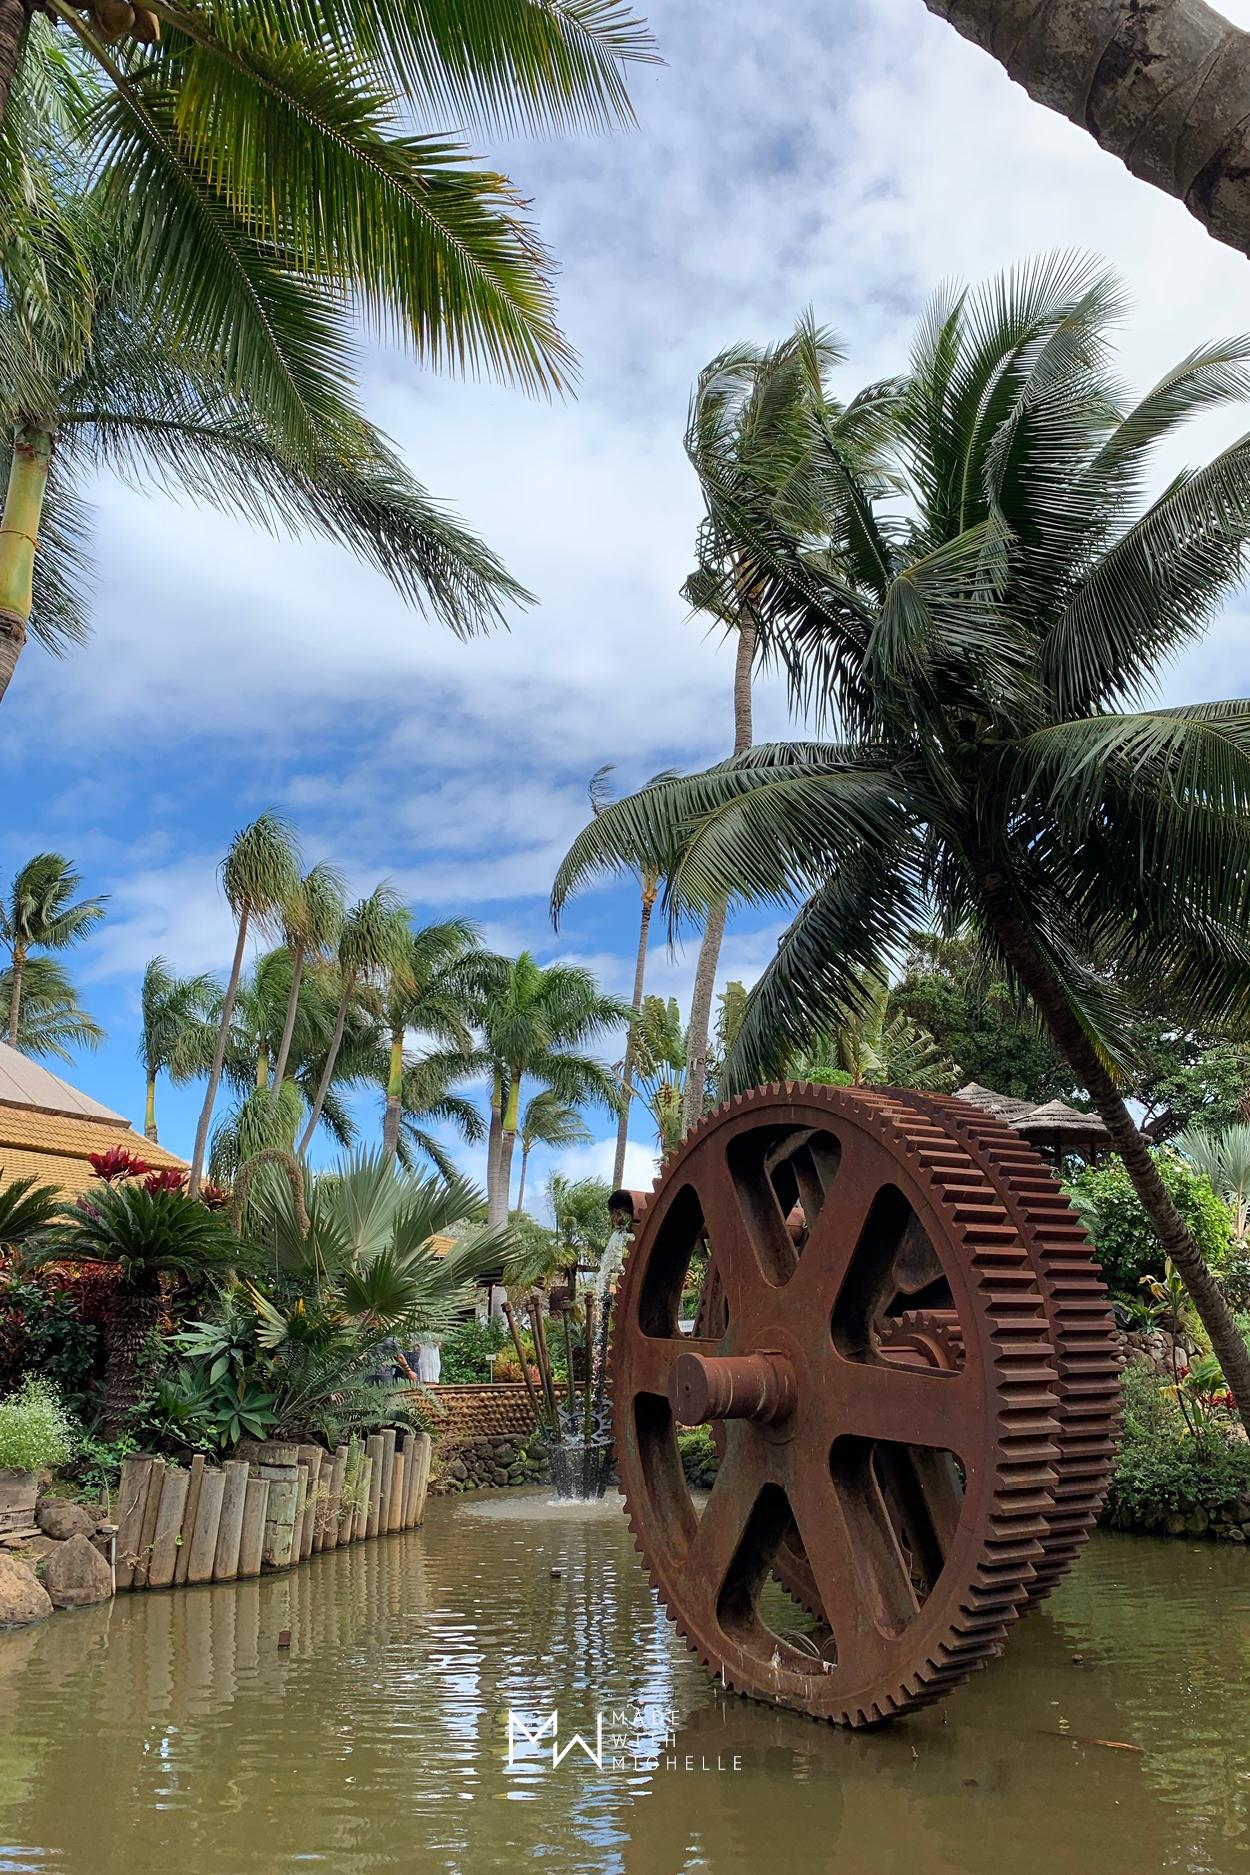 Things to do in Maui: Maui Tropical Plantation